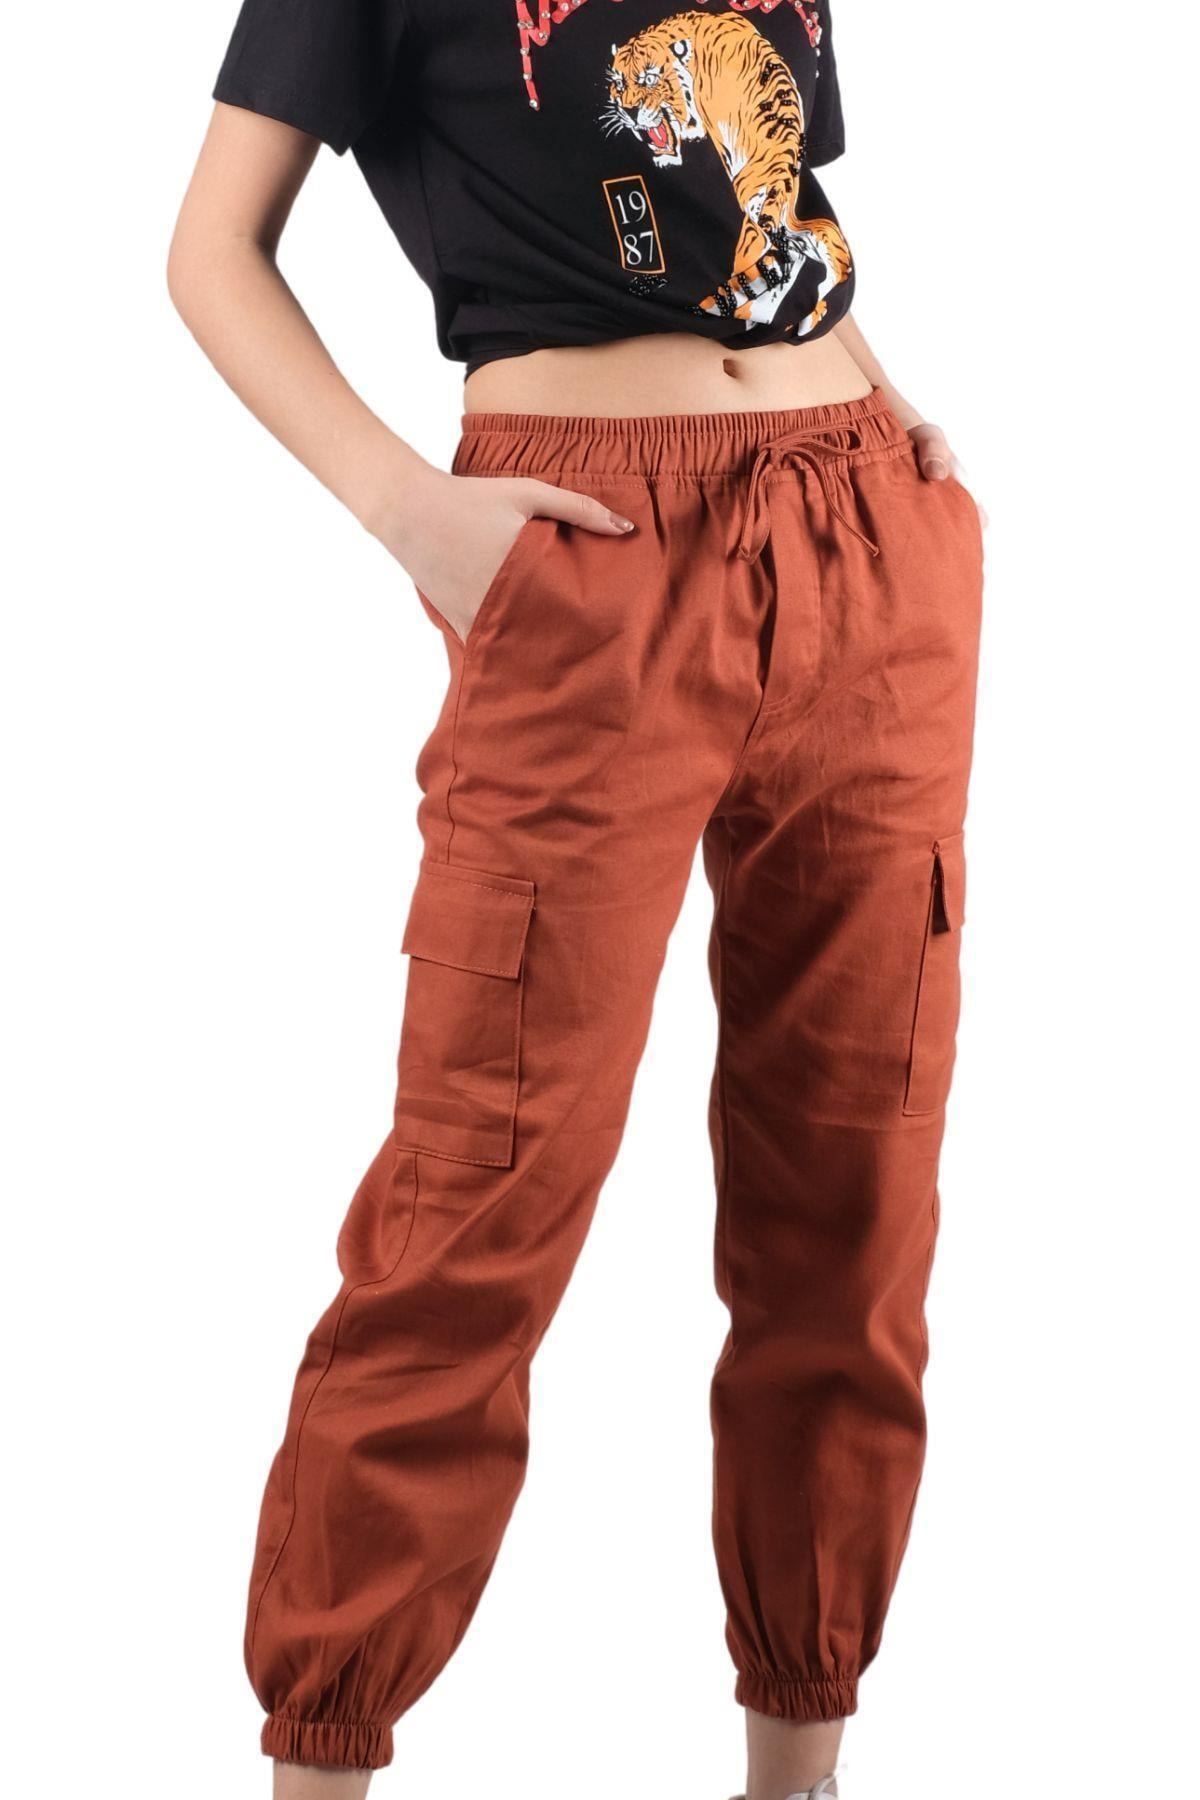 ŞİMAL Beli Paçası Lastikli Kargo Pantolon 1